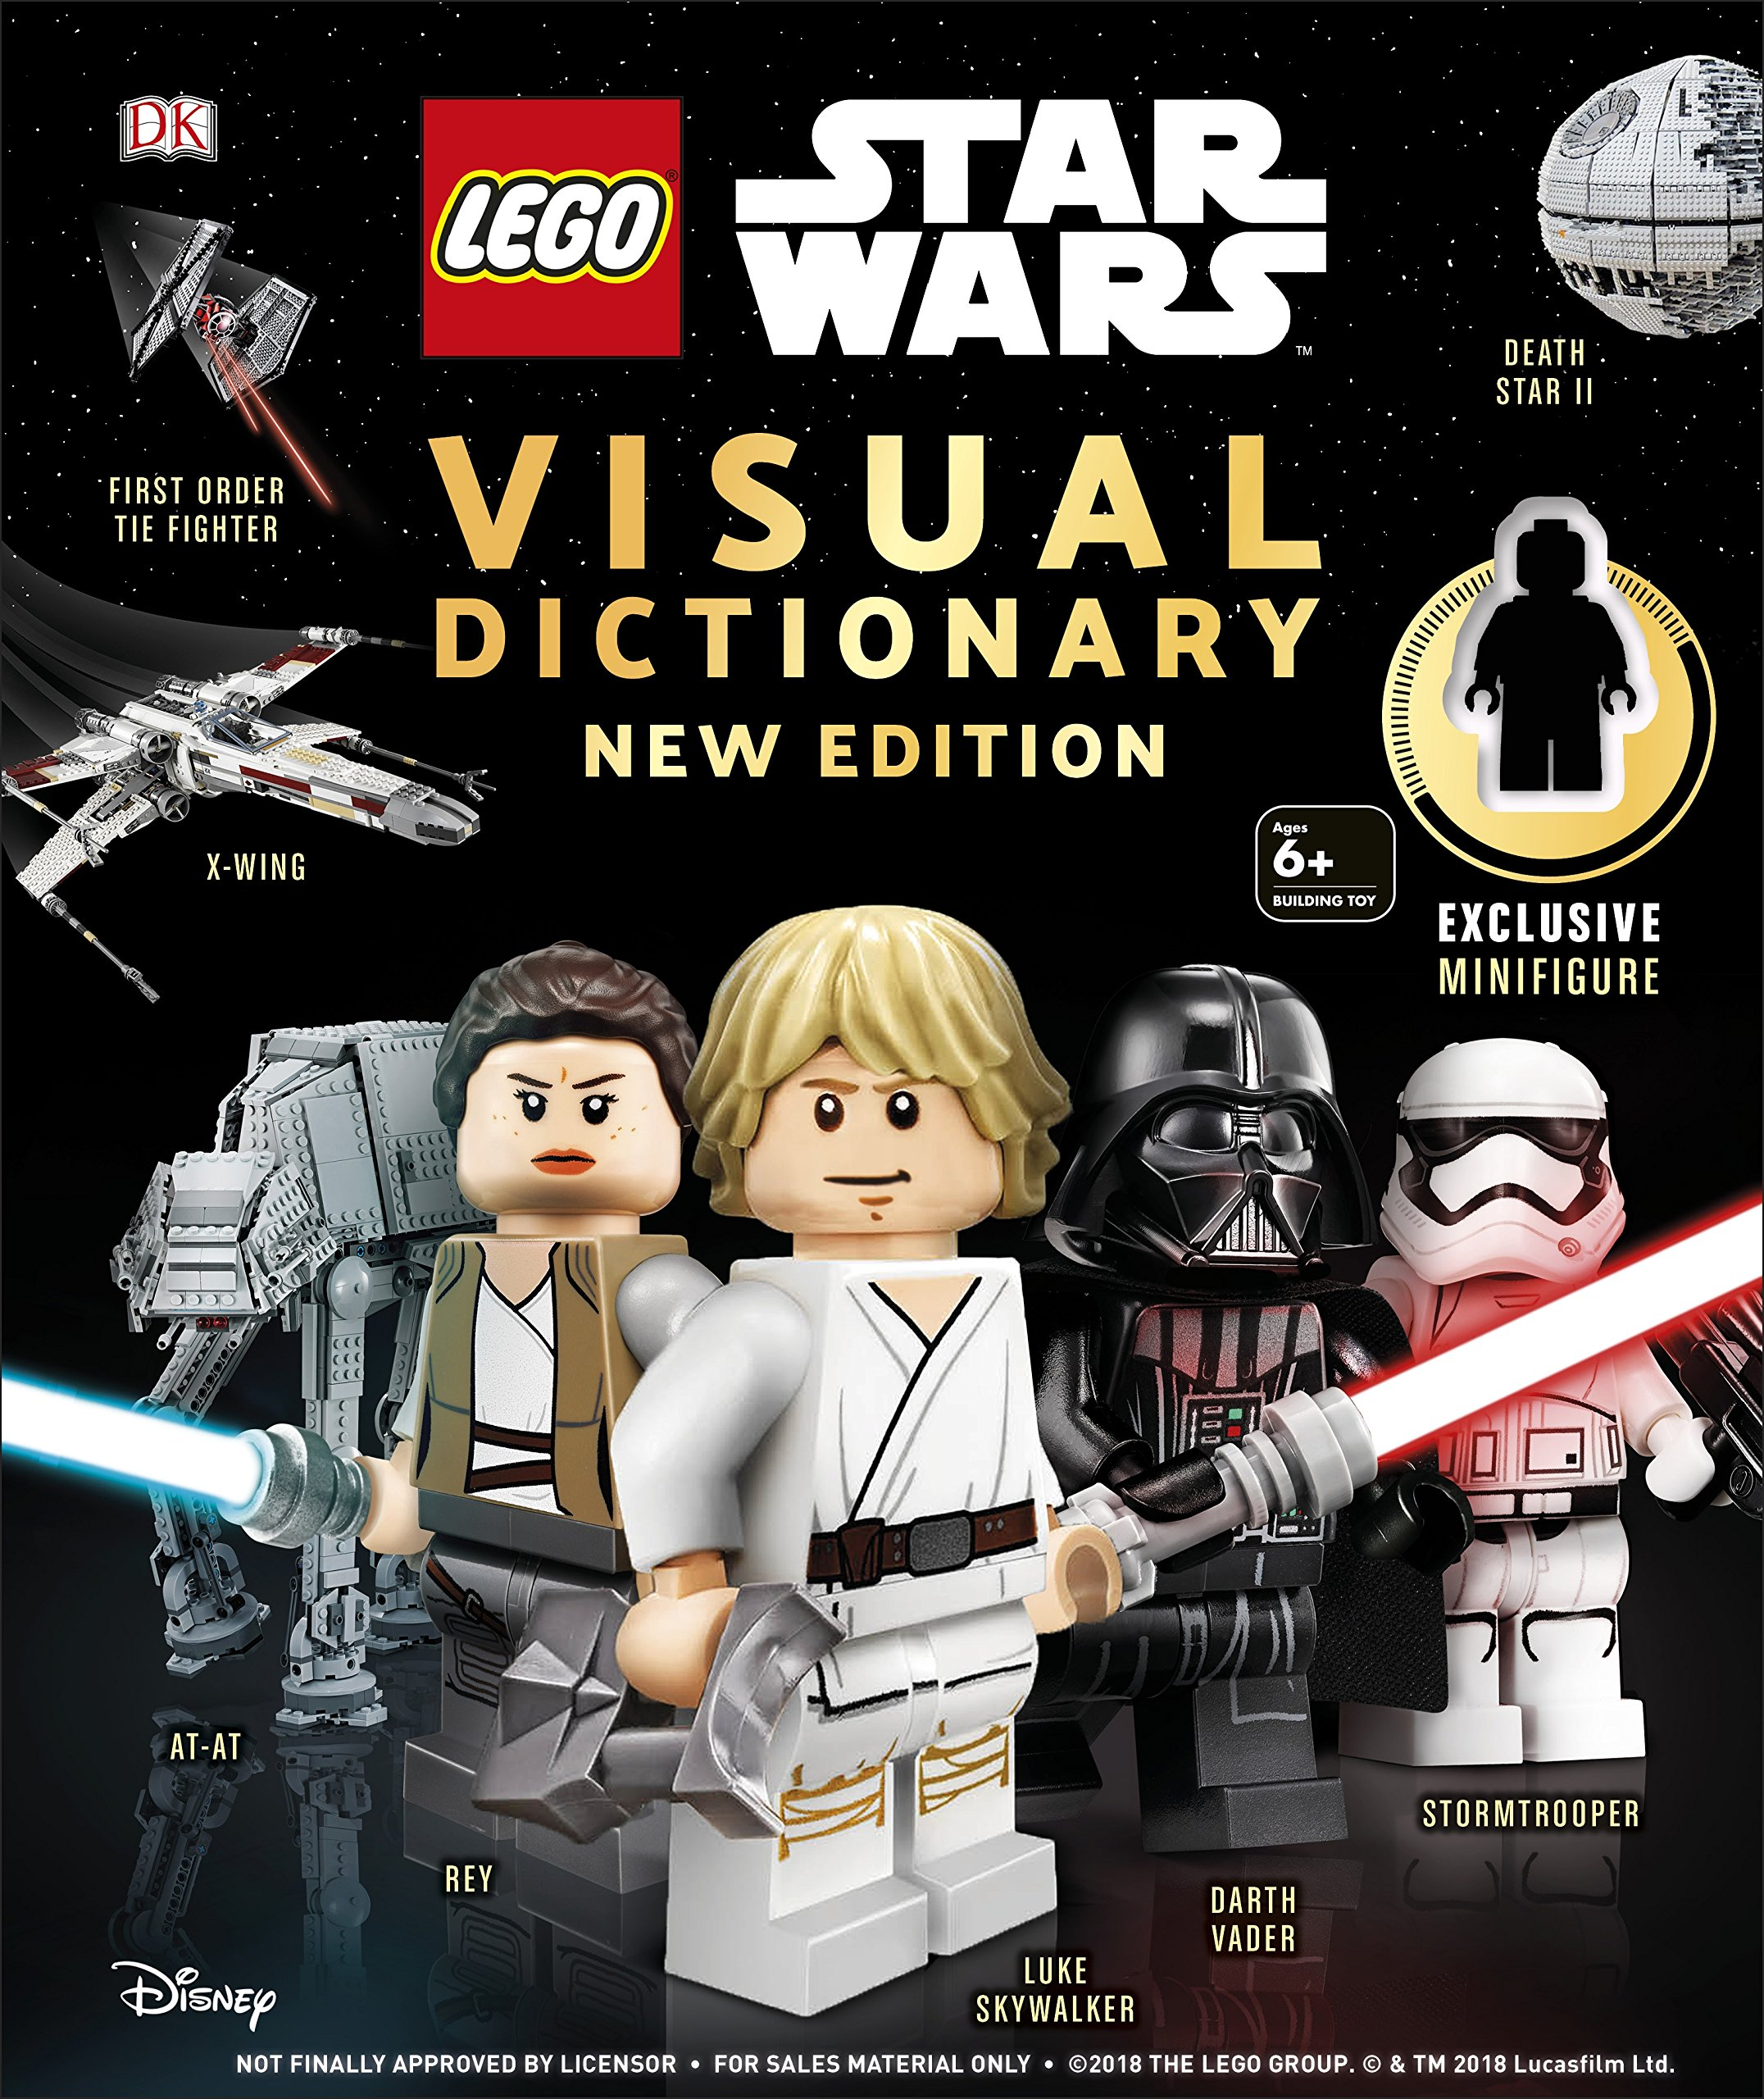 Lego Star Wars Visual Dictionary Edition Coming Soon